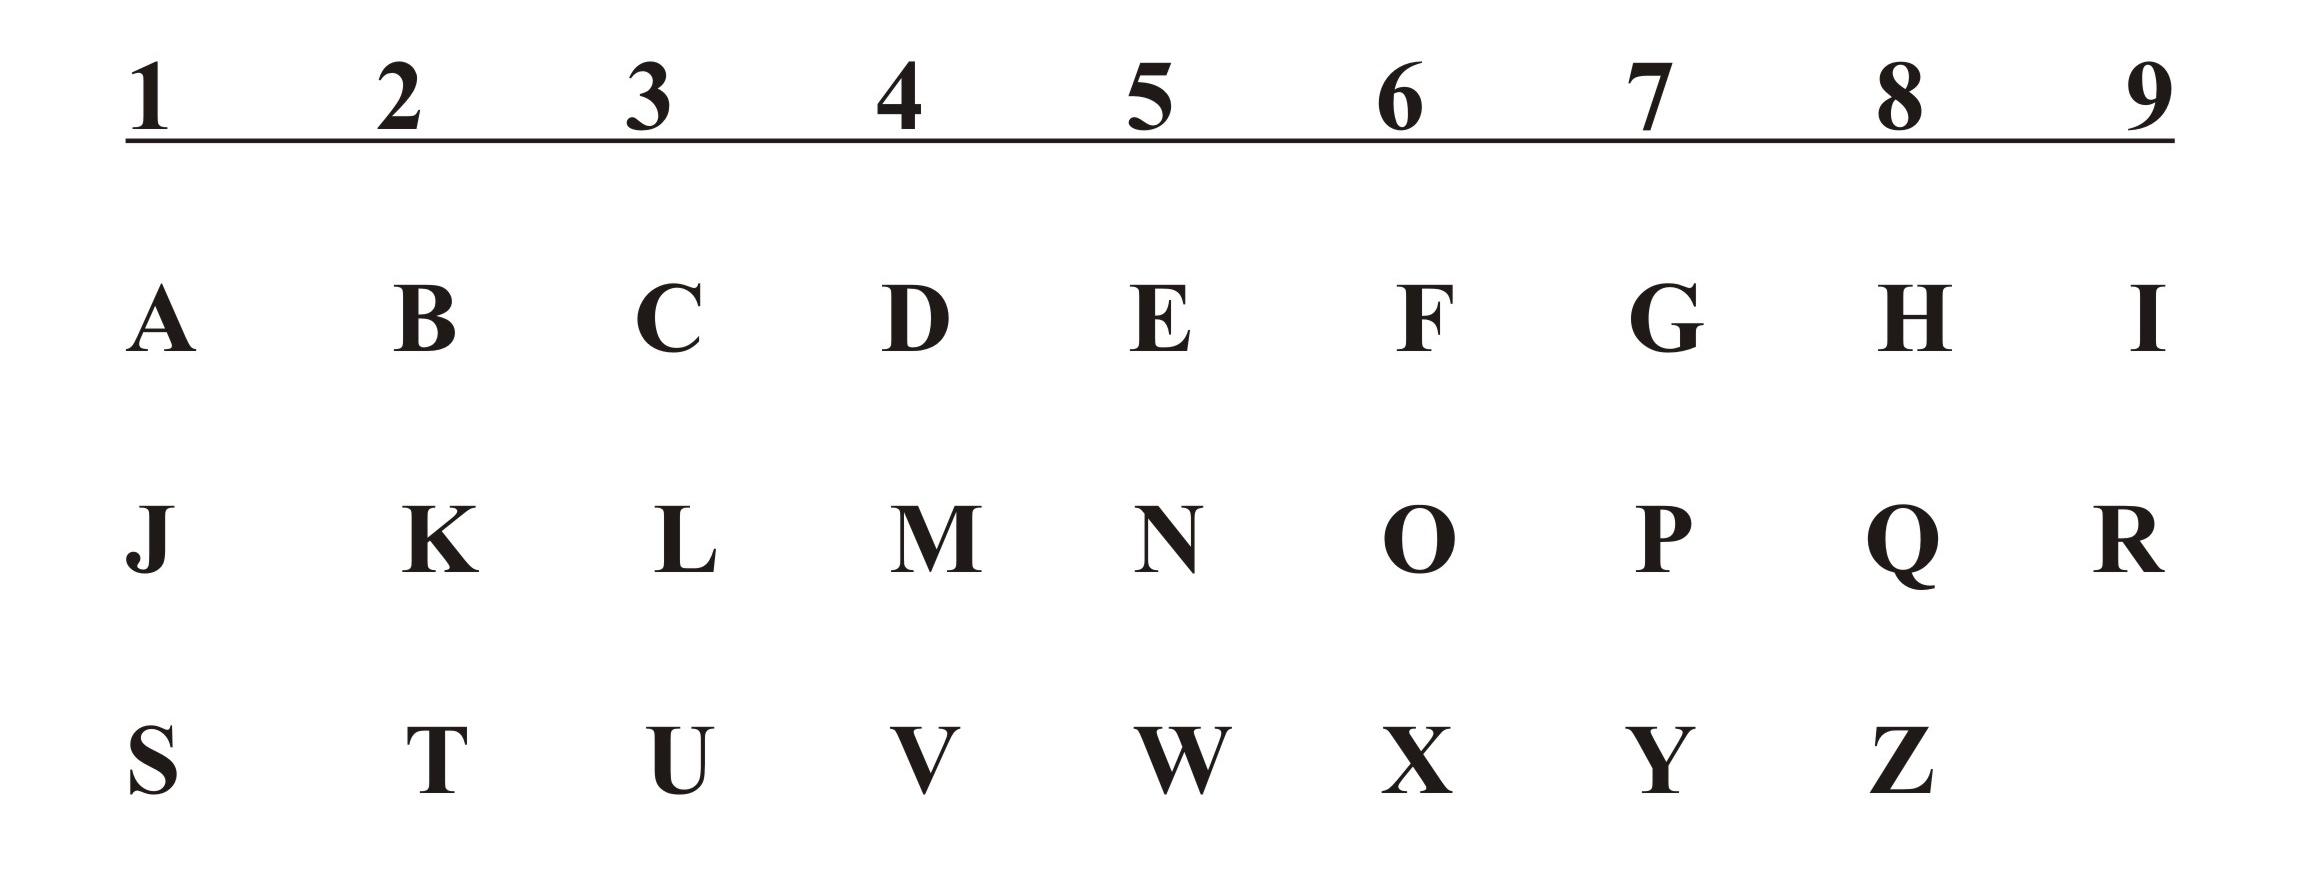 Numerology chart alphabet seventh life path greek alphabet in